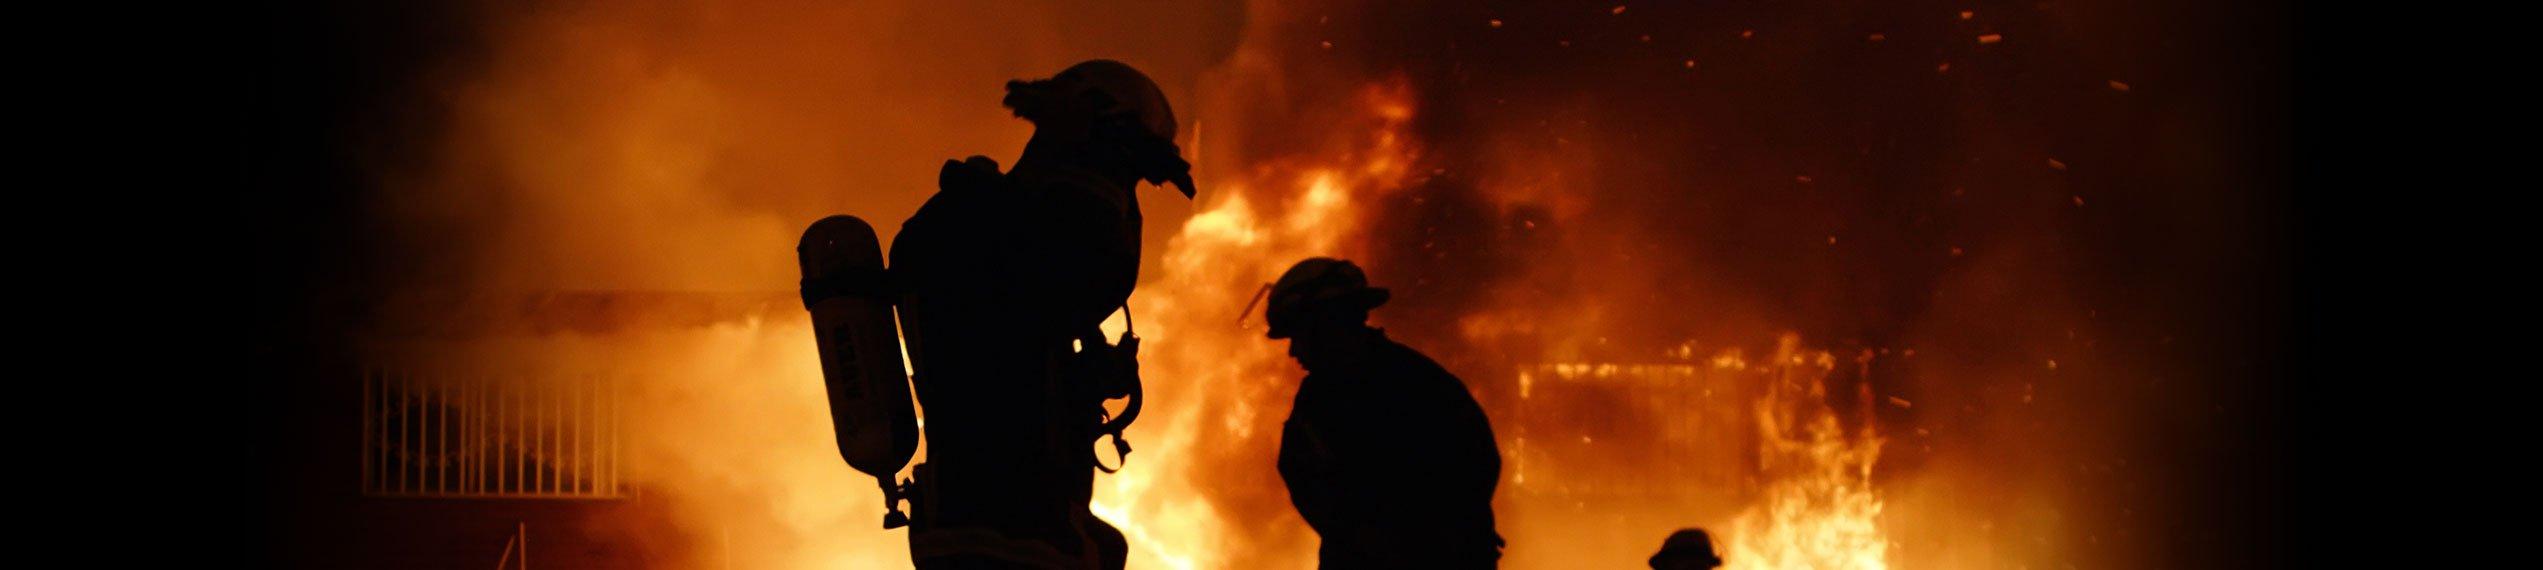 Fire & Smoke Damage Removal in Paul Davis Restoration of Rockland County, NY